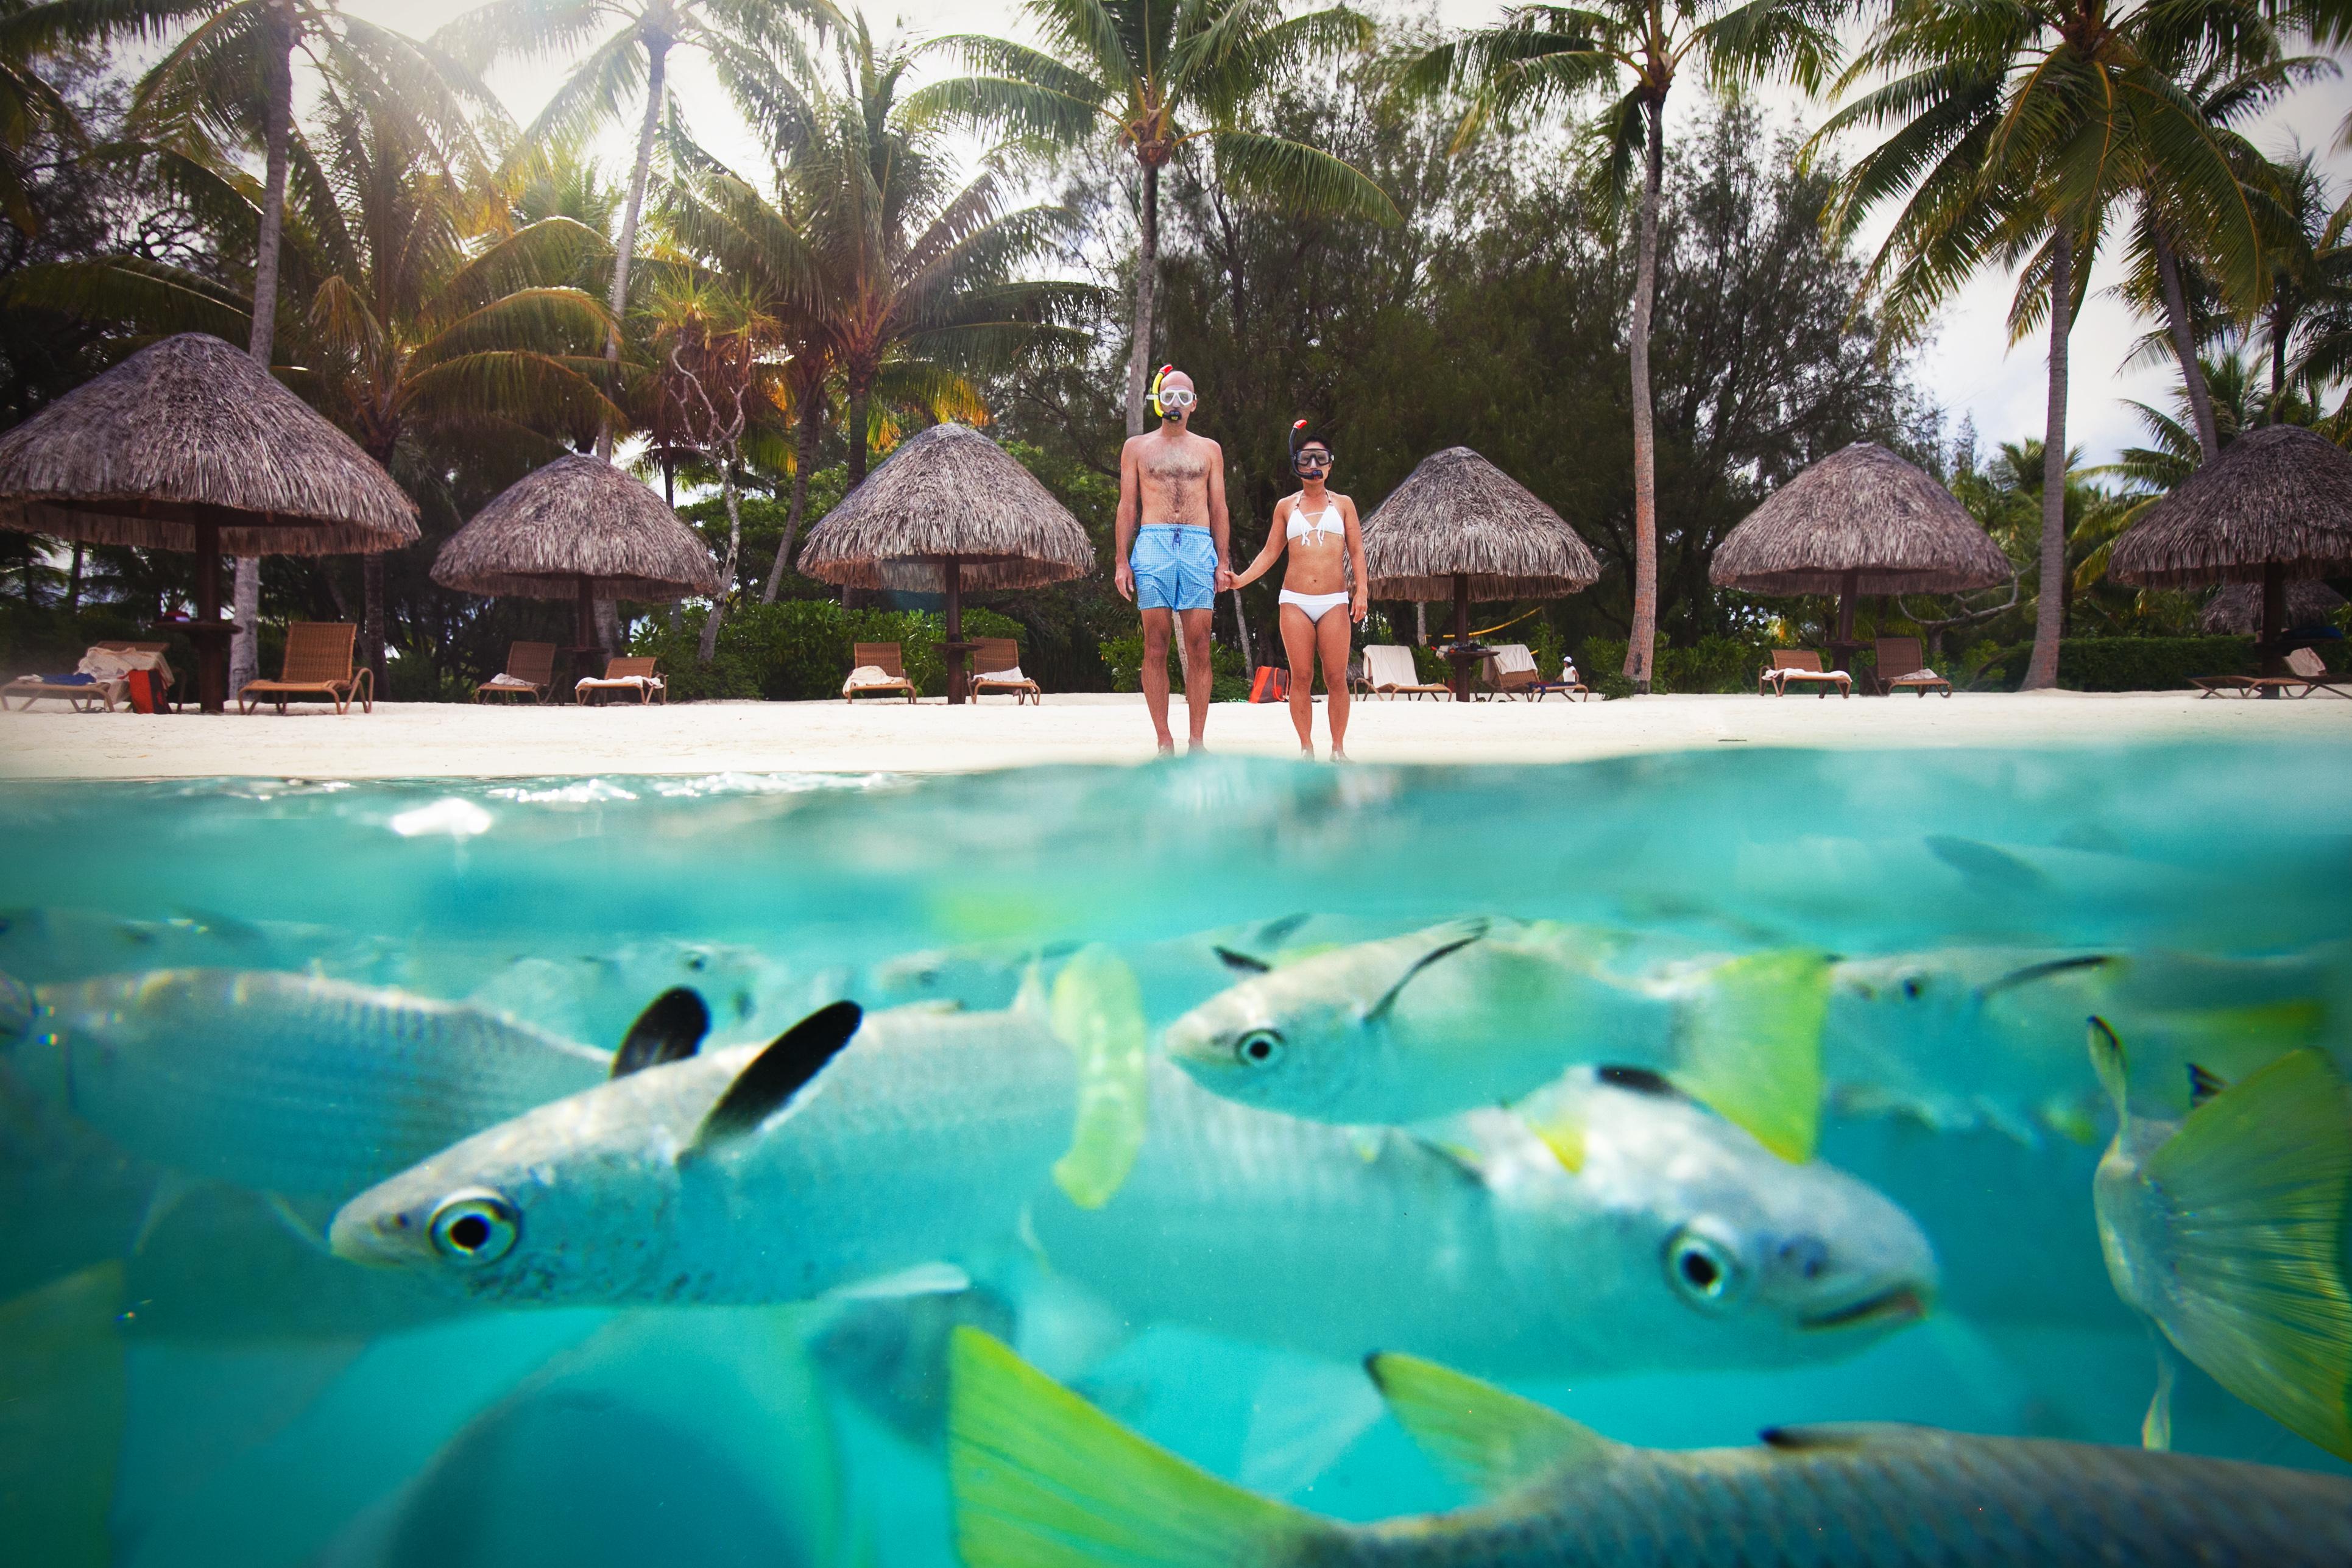 Underwater portrait in Bora Bora lagoon - photo by Callaway Gable